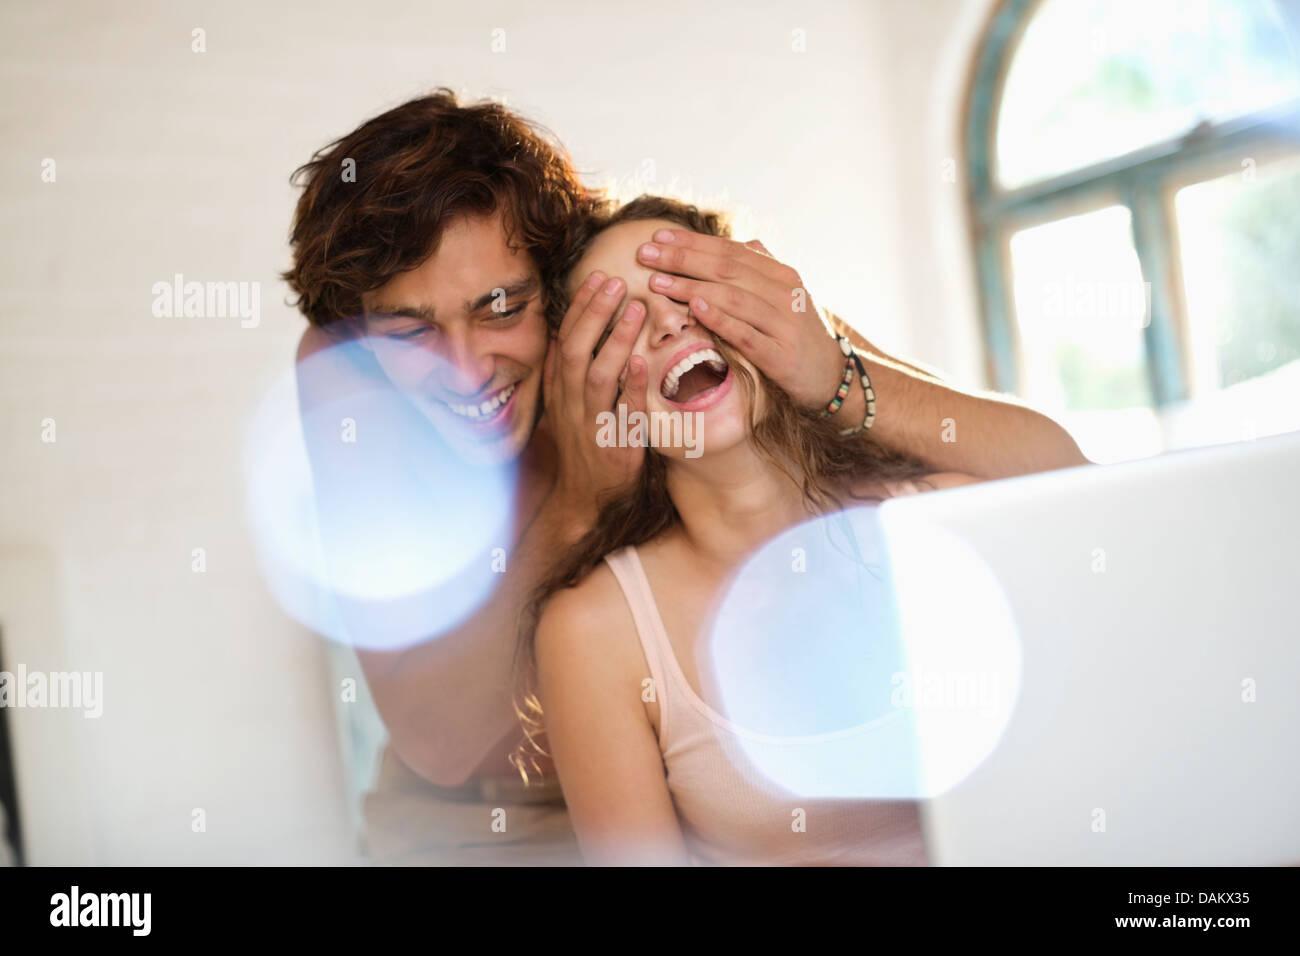 Man covering girlfriend's eyes indoors - Stock Image